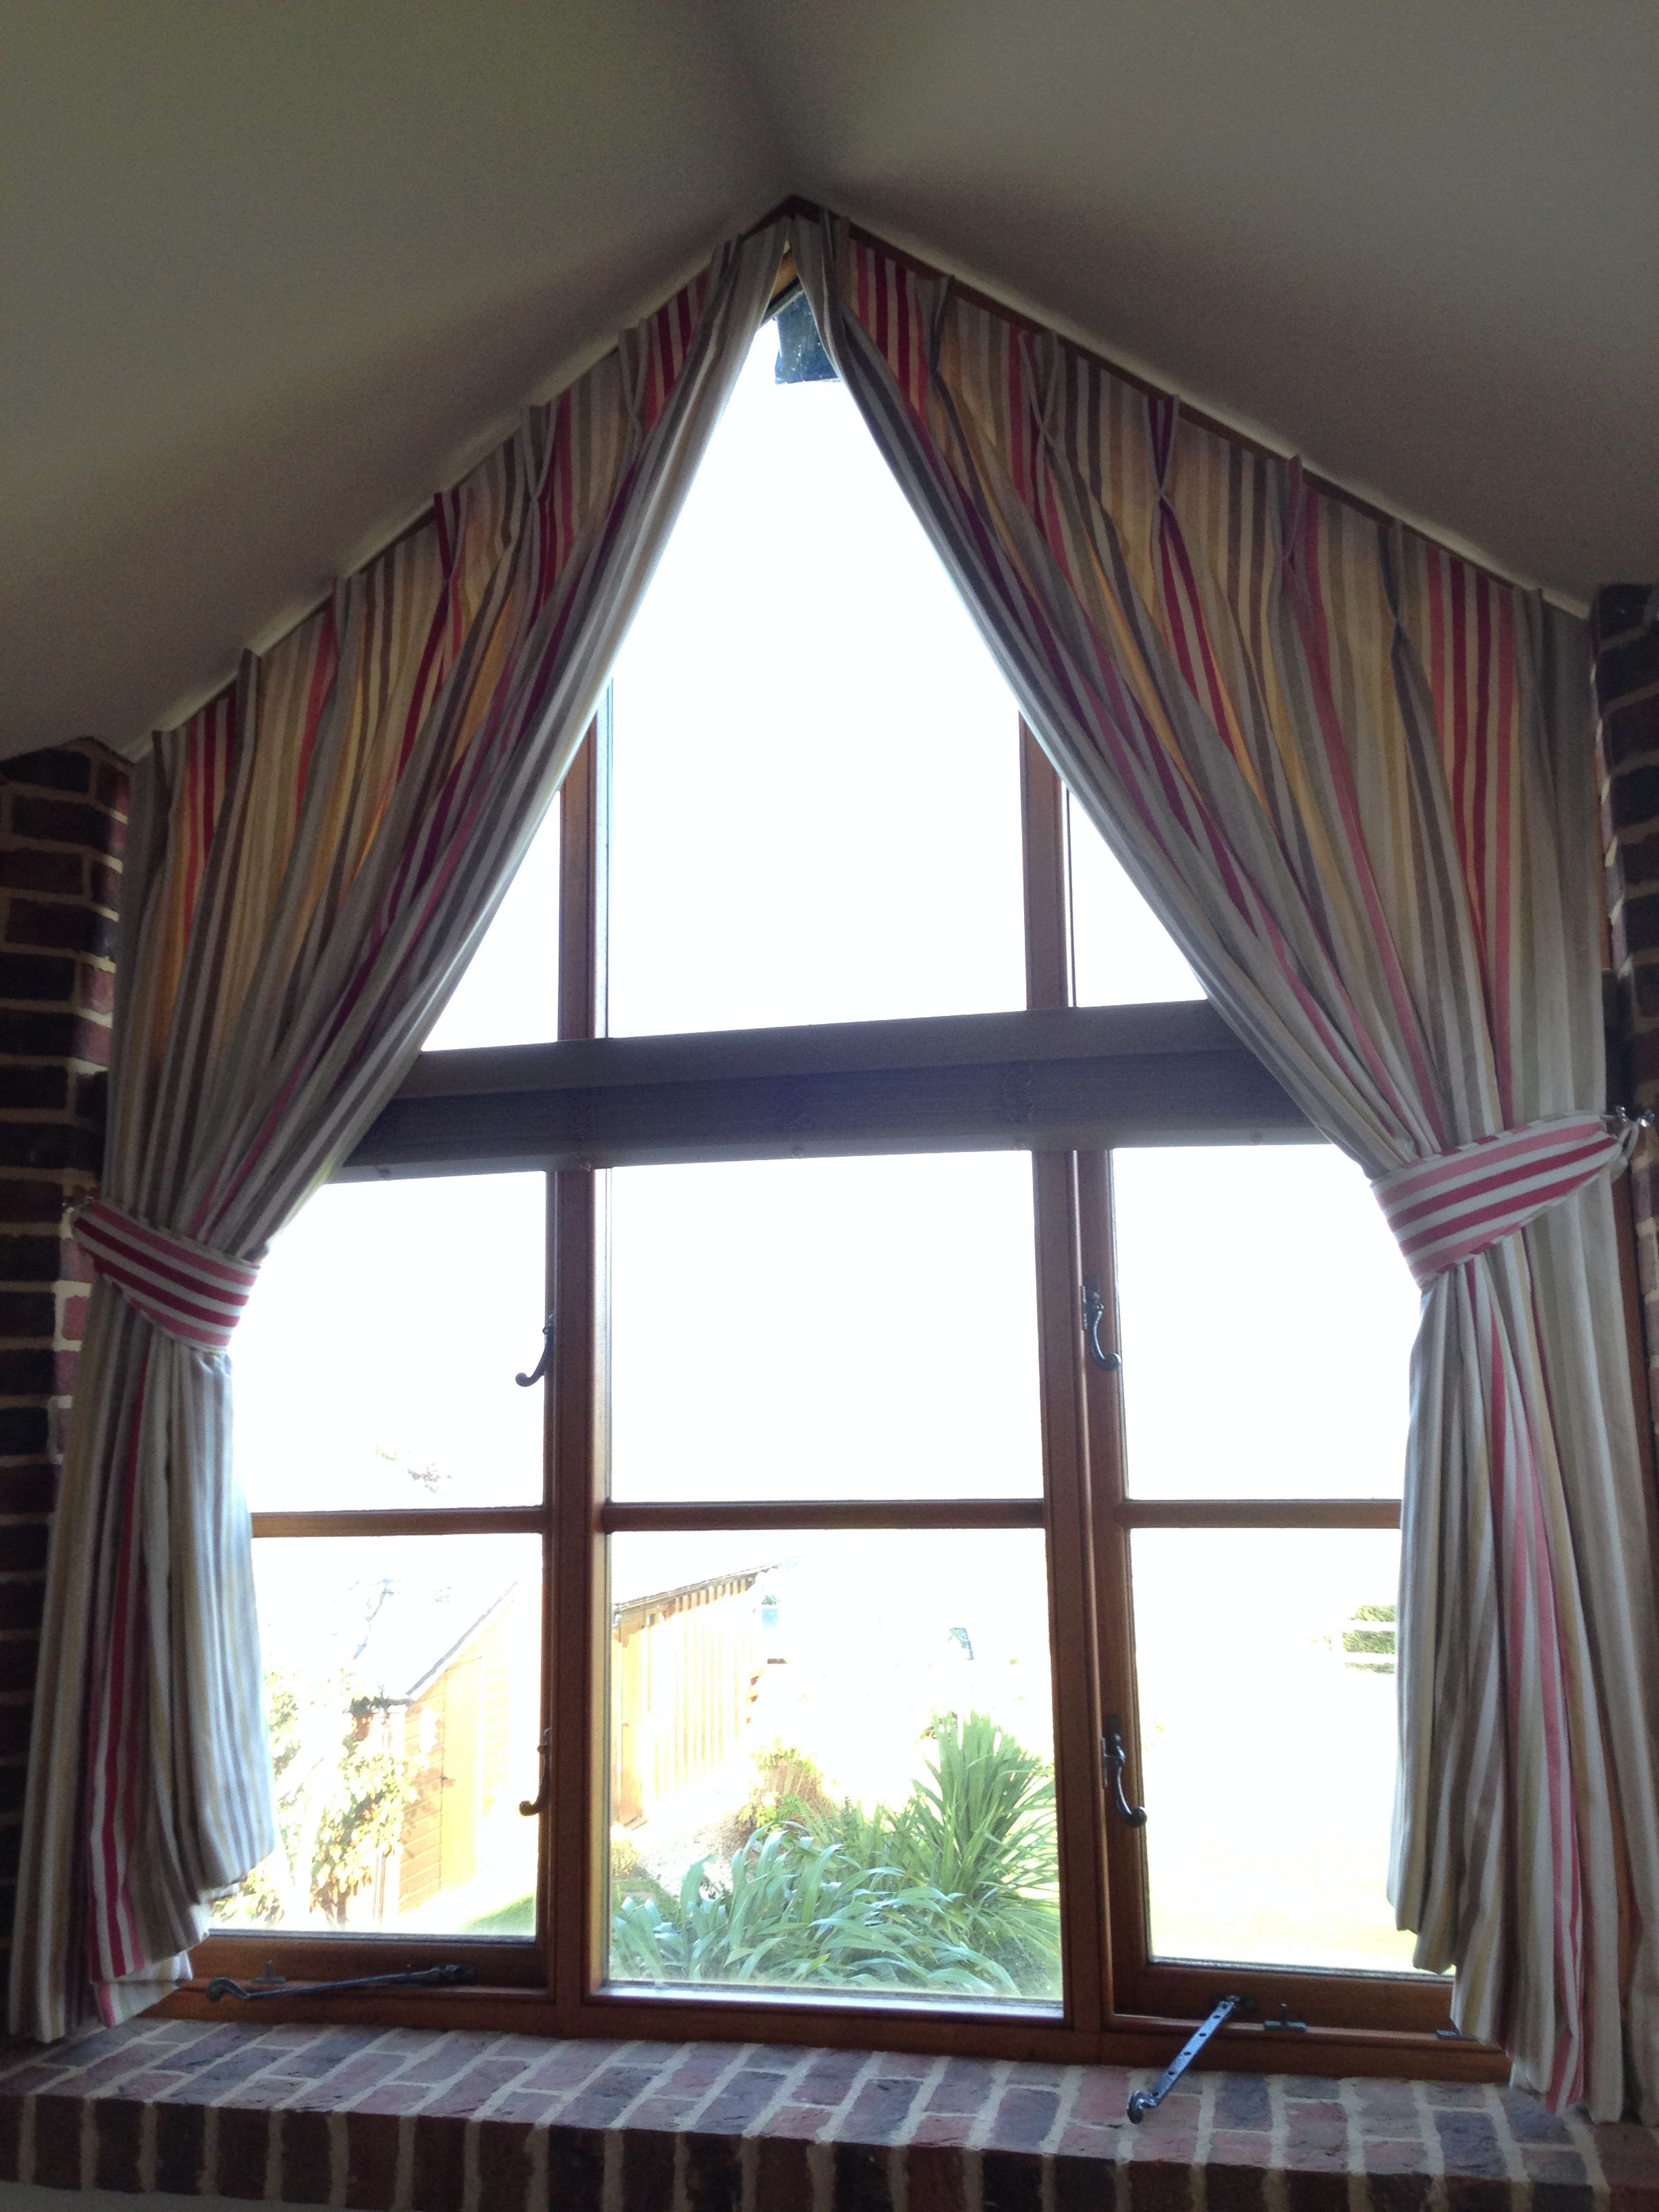 ny treatments electric tribeca city by nyc shades nycityblinds project shade blinds window skylight motorized privacy